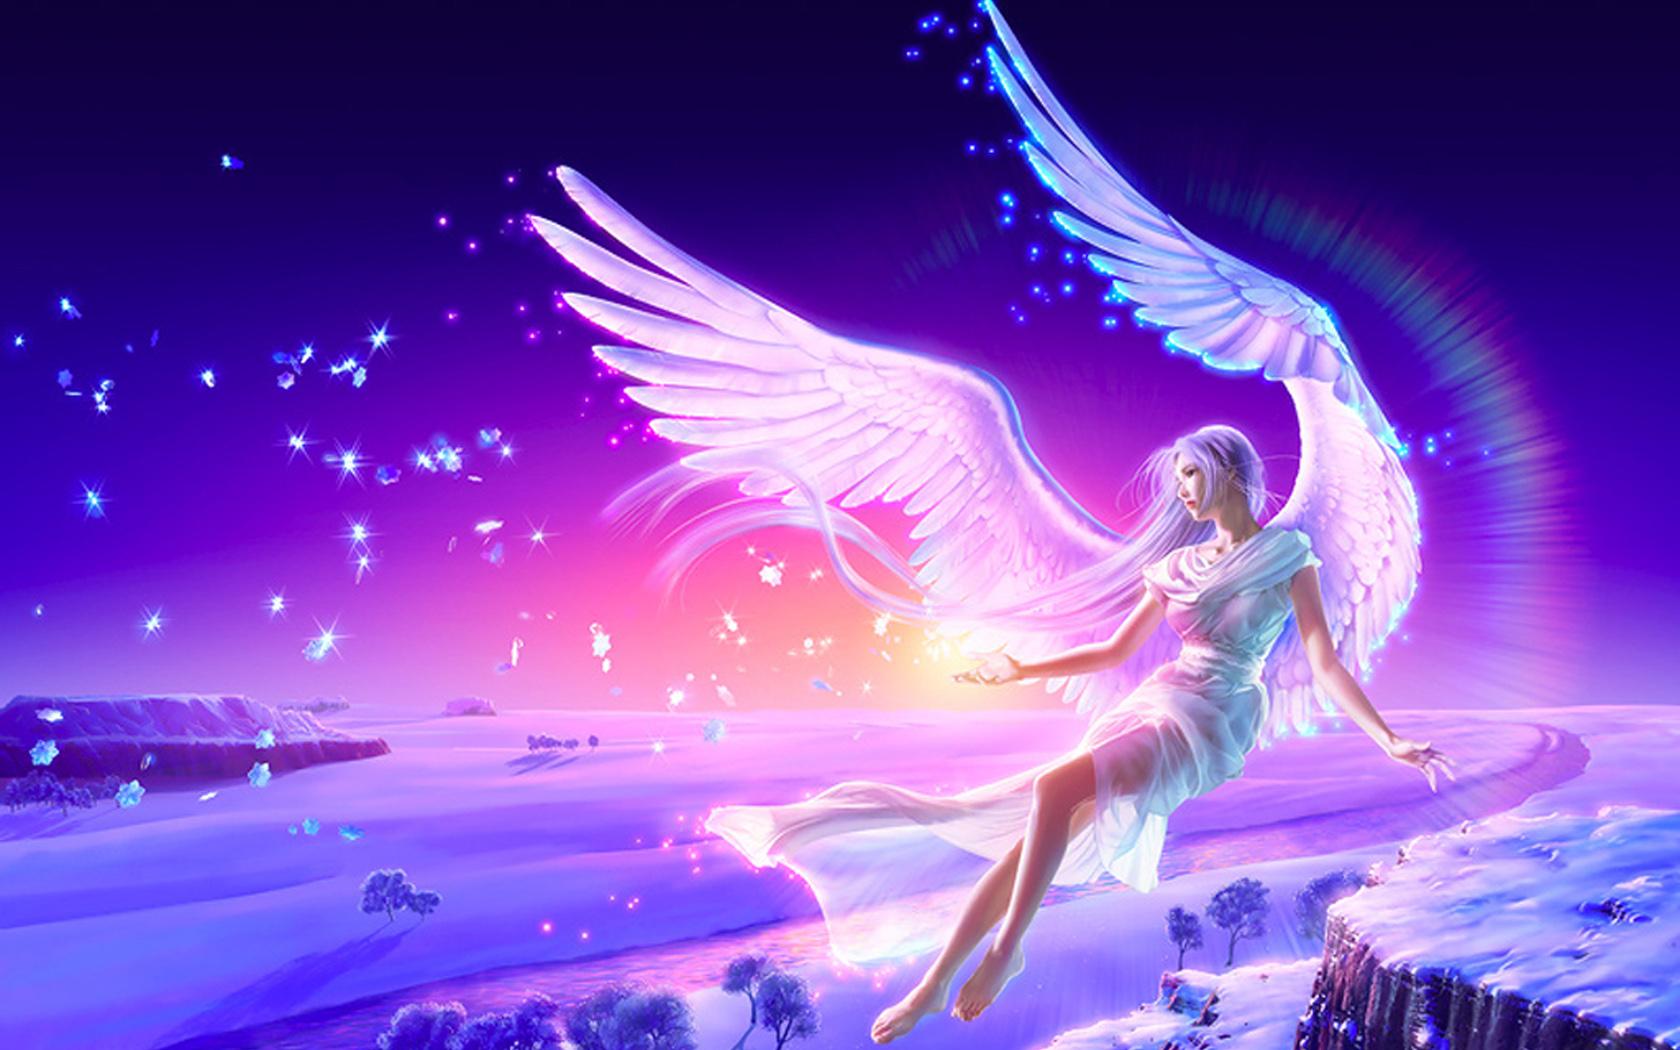 Una chica con alas - 1680x1050